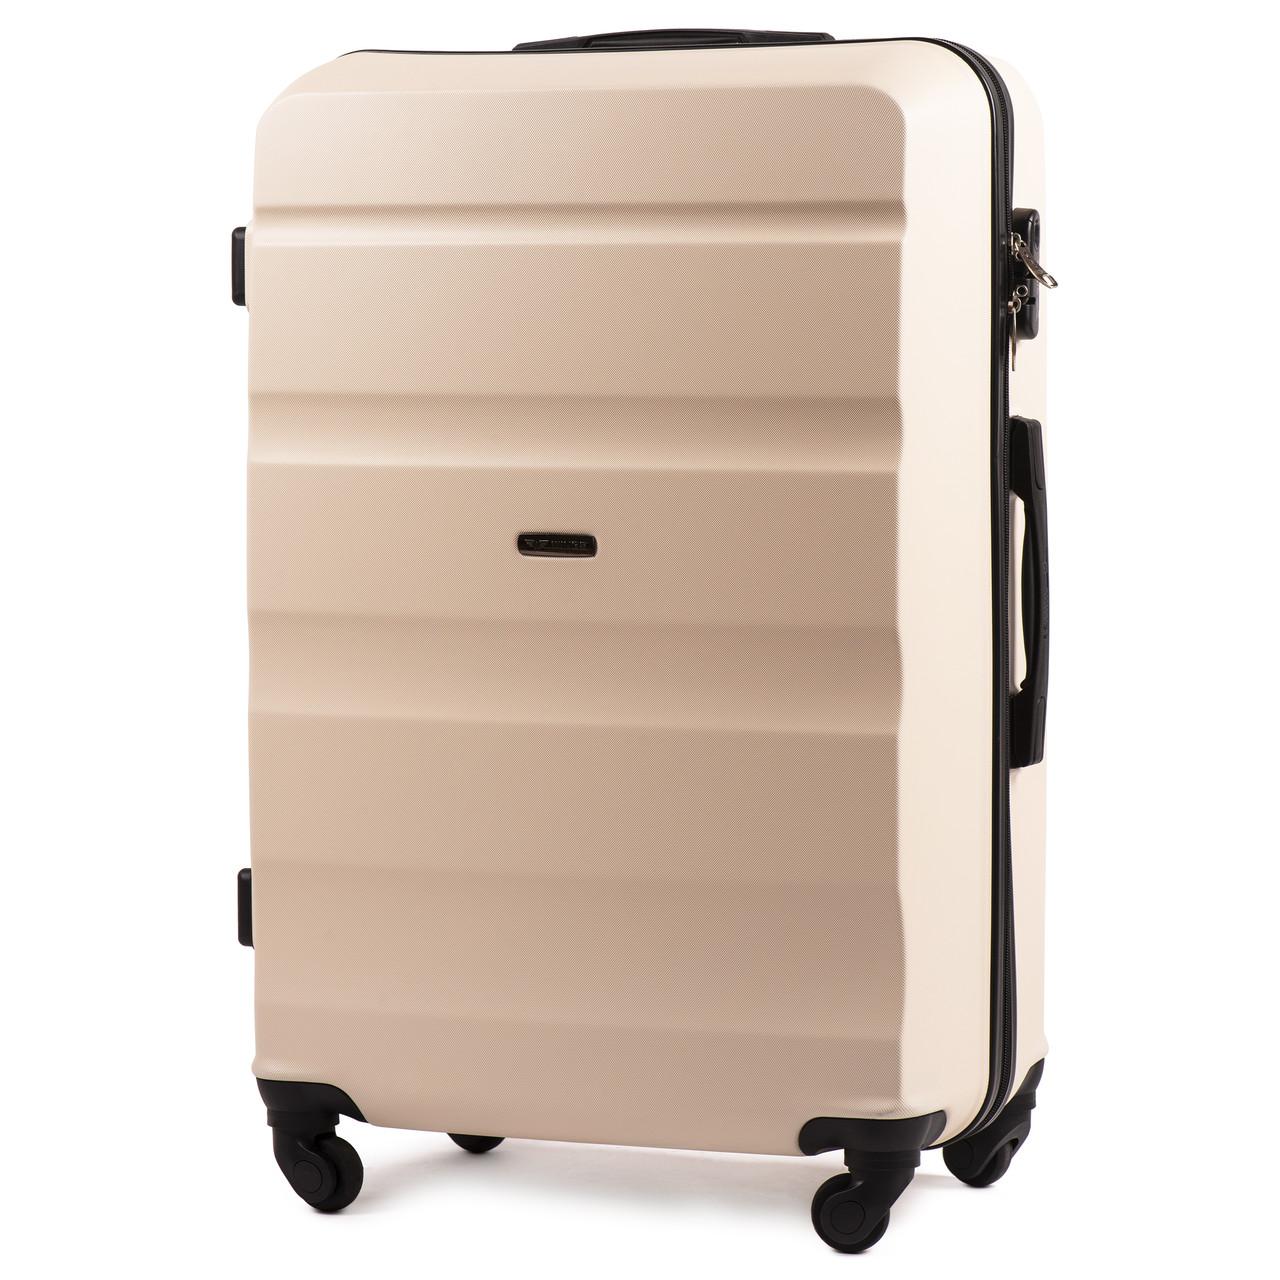 Малый пластиковый чемодан Wings AT01 на 4 колесах бежевый